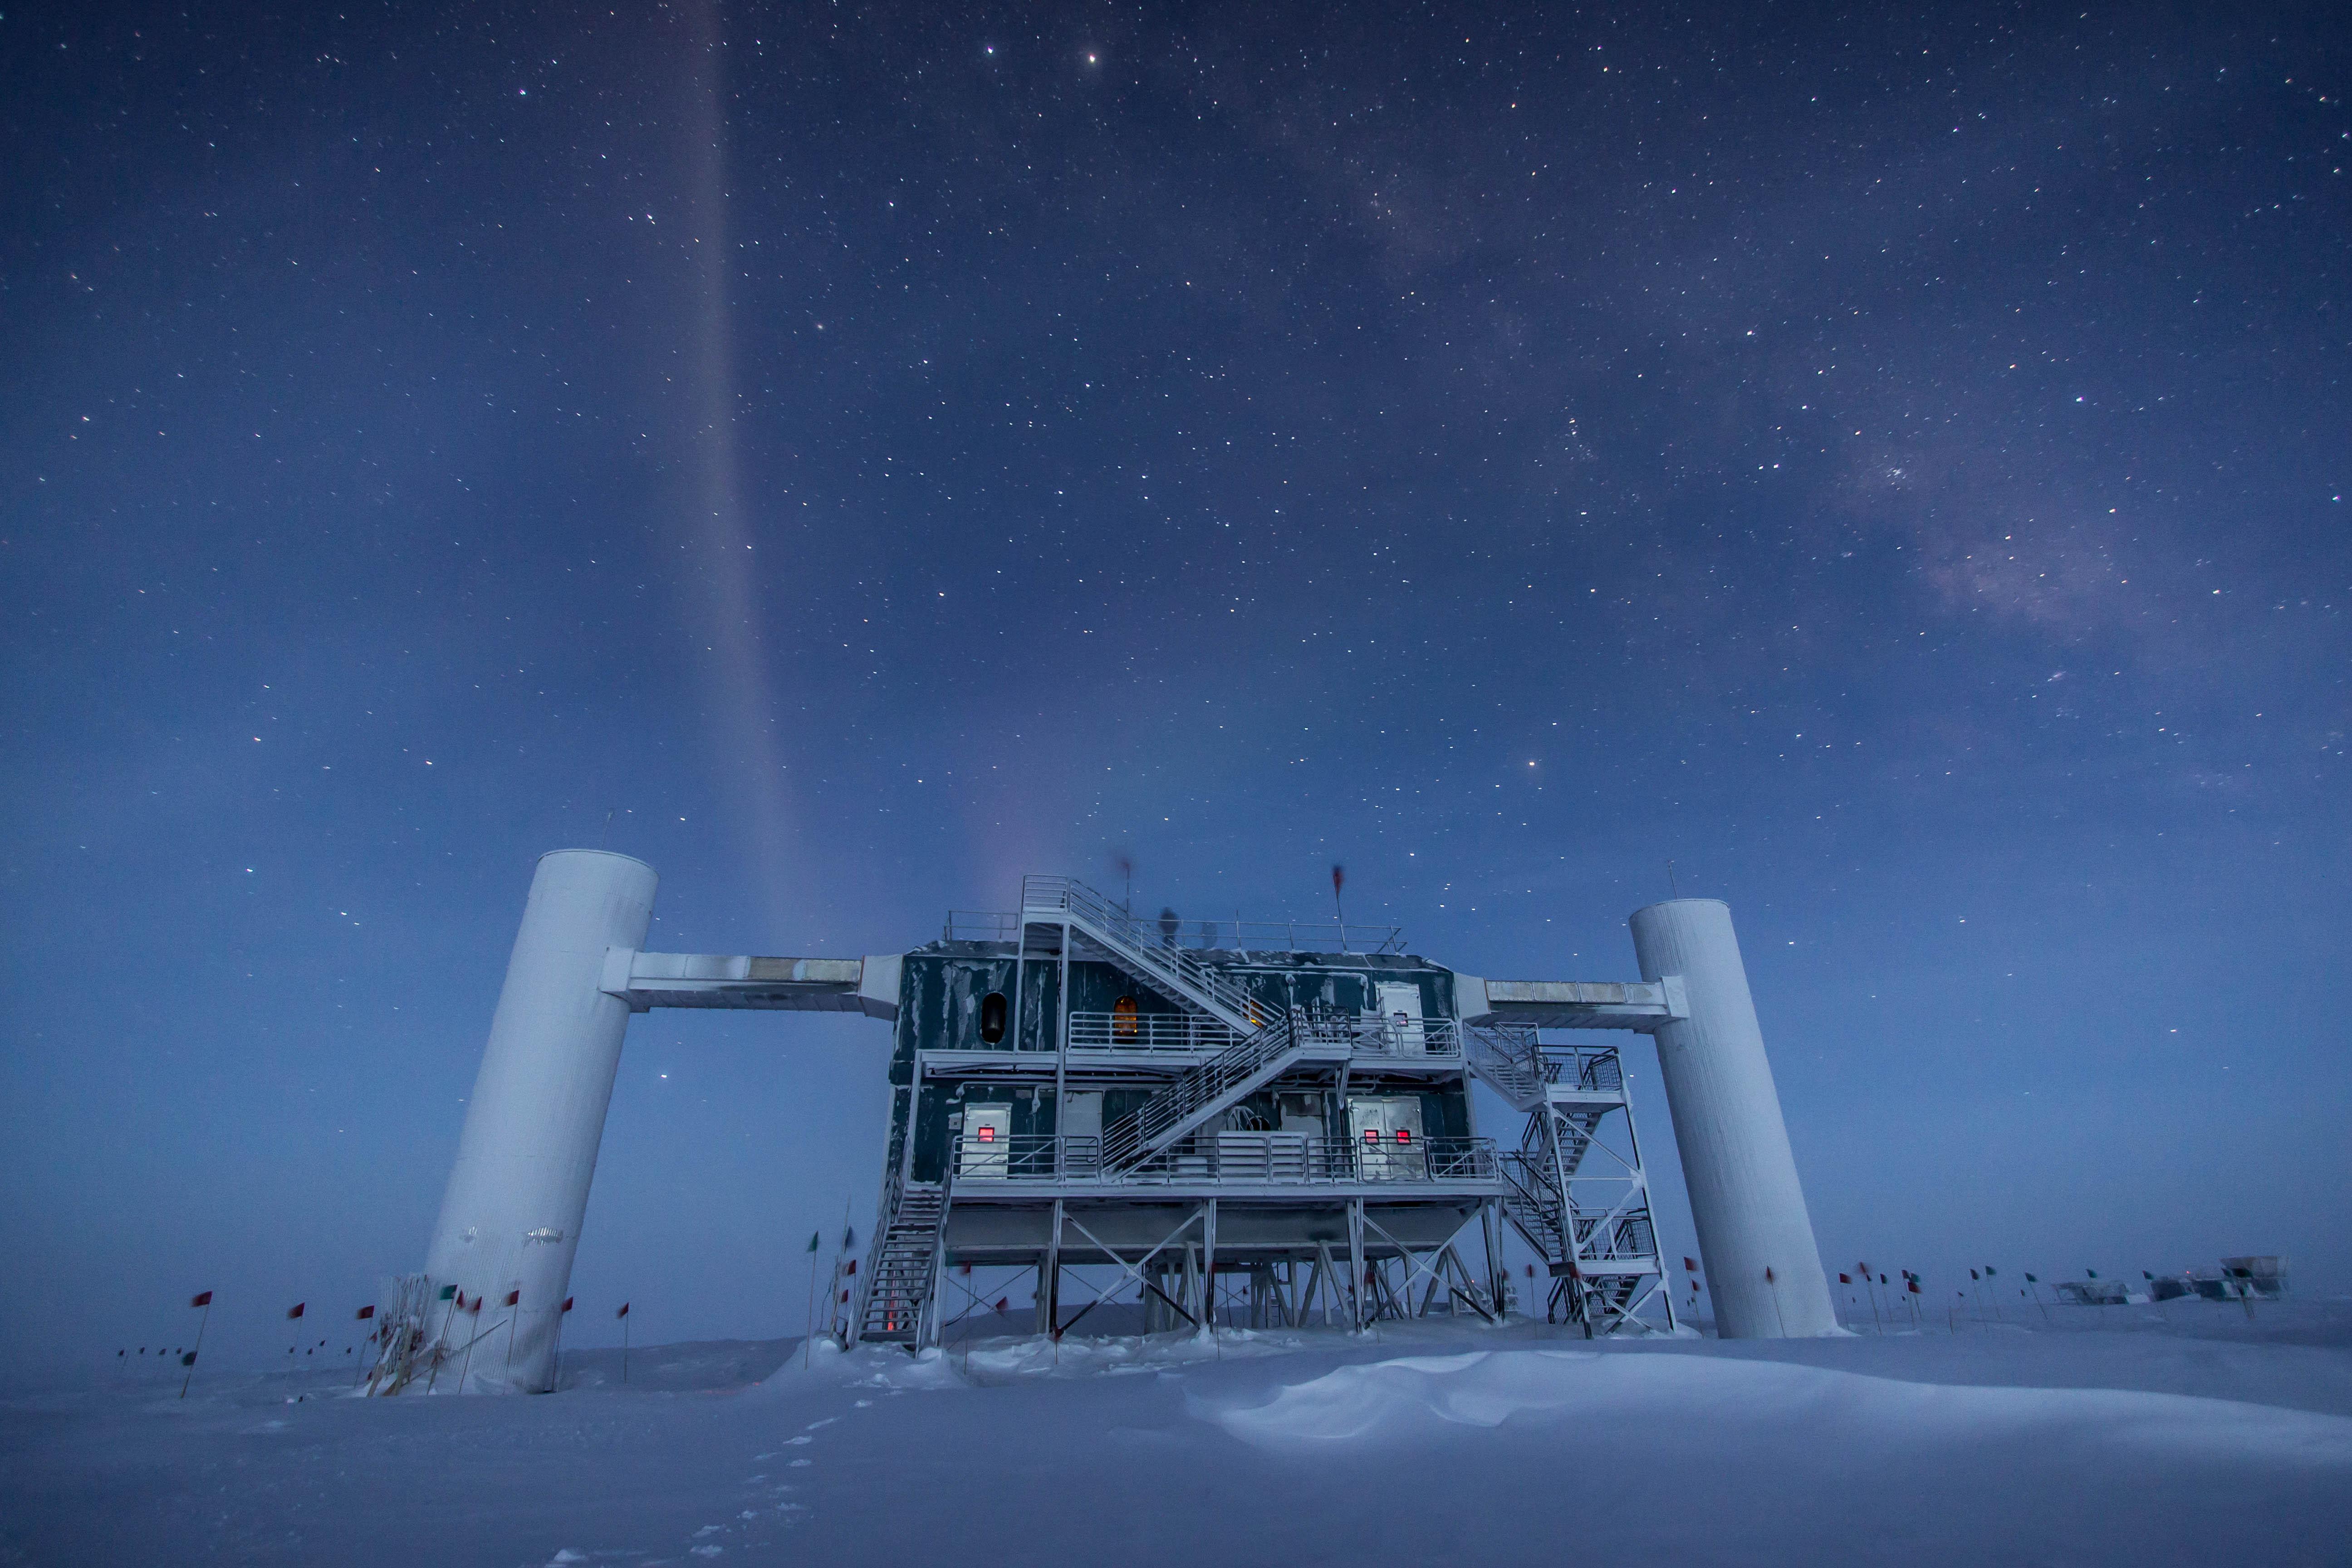 Il laboratorio IceCube sotto le stelle,               2013. Credit: Felipe Pedreros, IceCube/NSF.